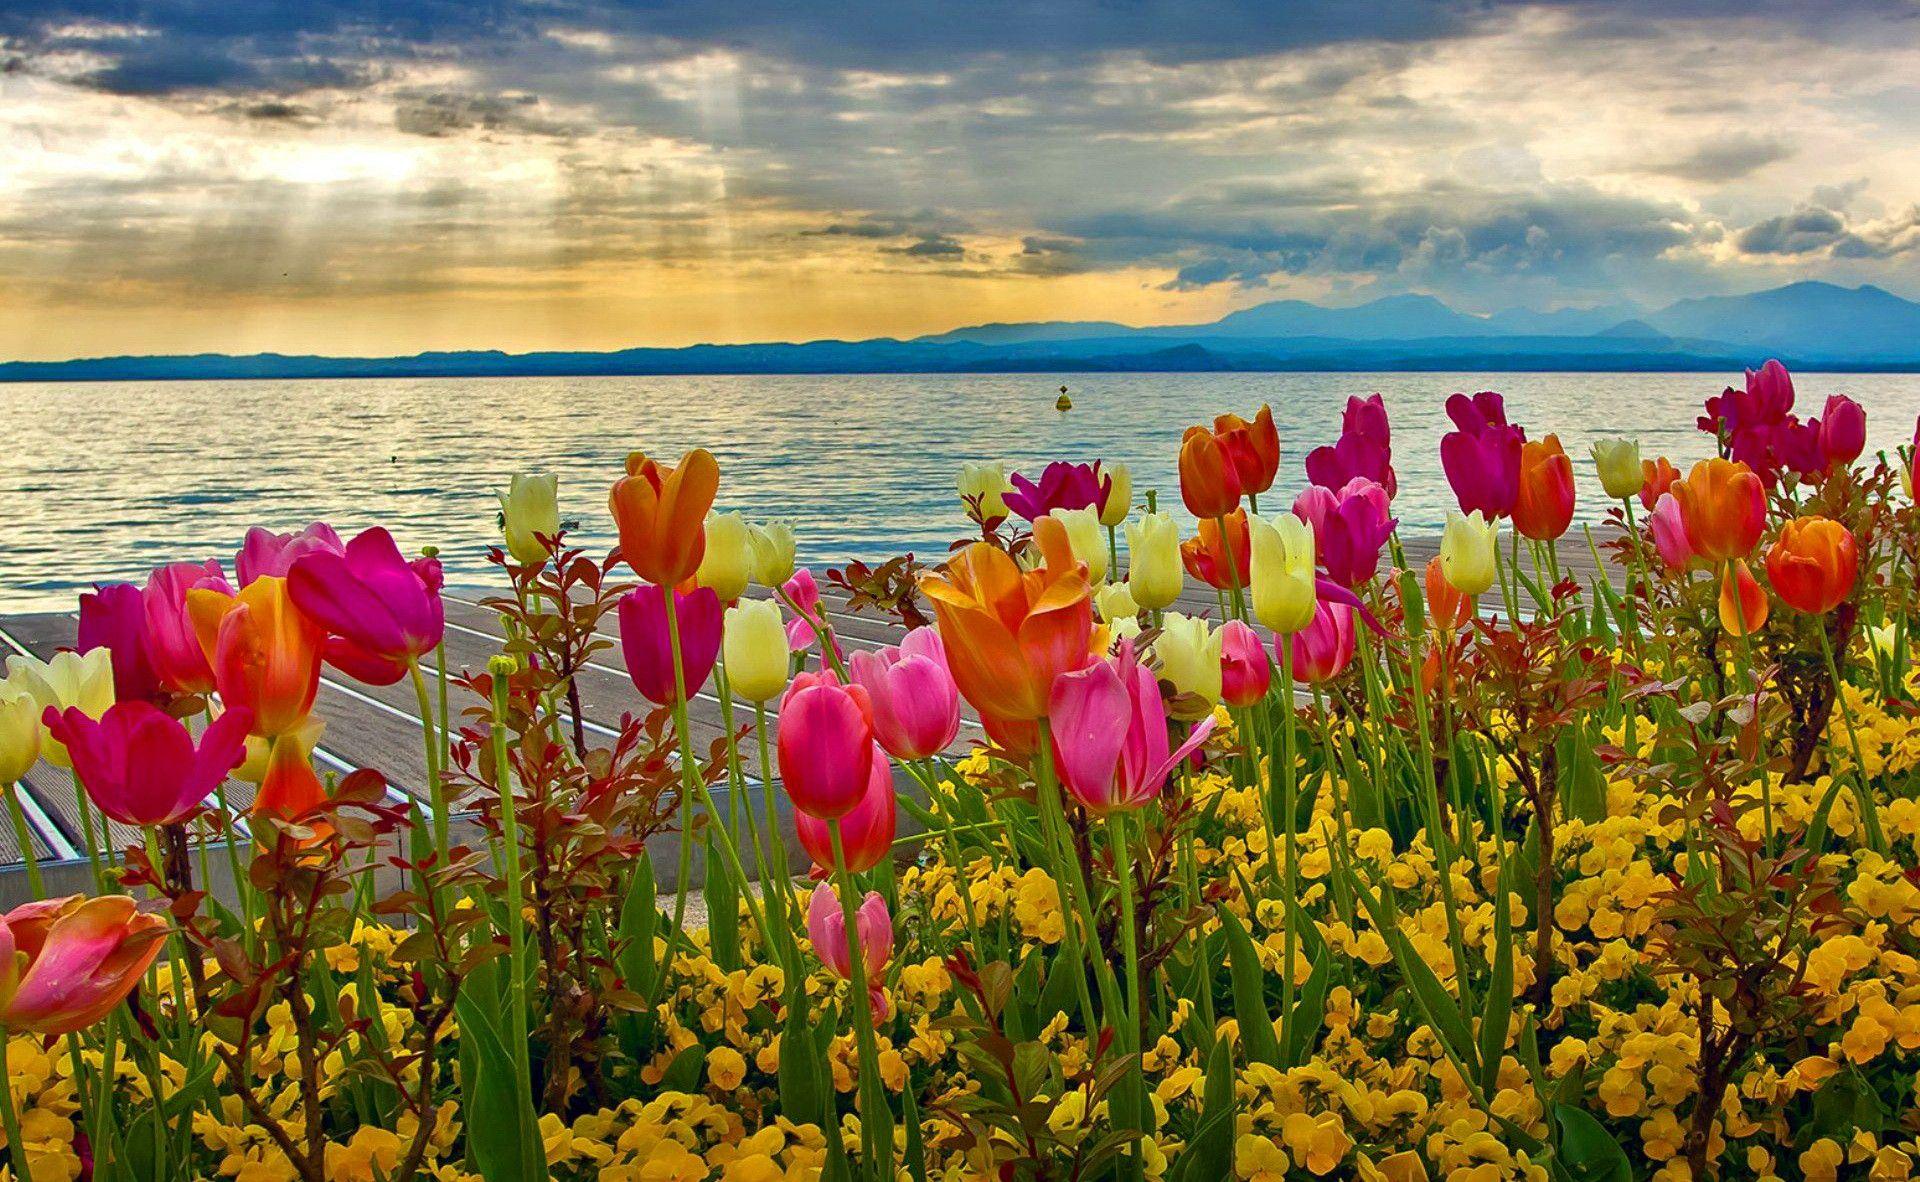 Free Download Spring Wallpapers Hd Download For Desktop Mobile Tablet 1920x1182 76 H In 2020 Spring Flowers Wallpaper Spring Desktop Wallpaper Spring Wallpaper